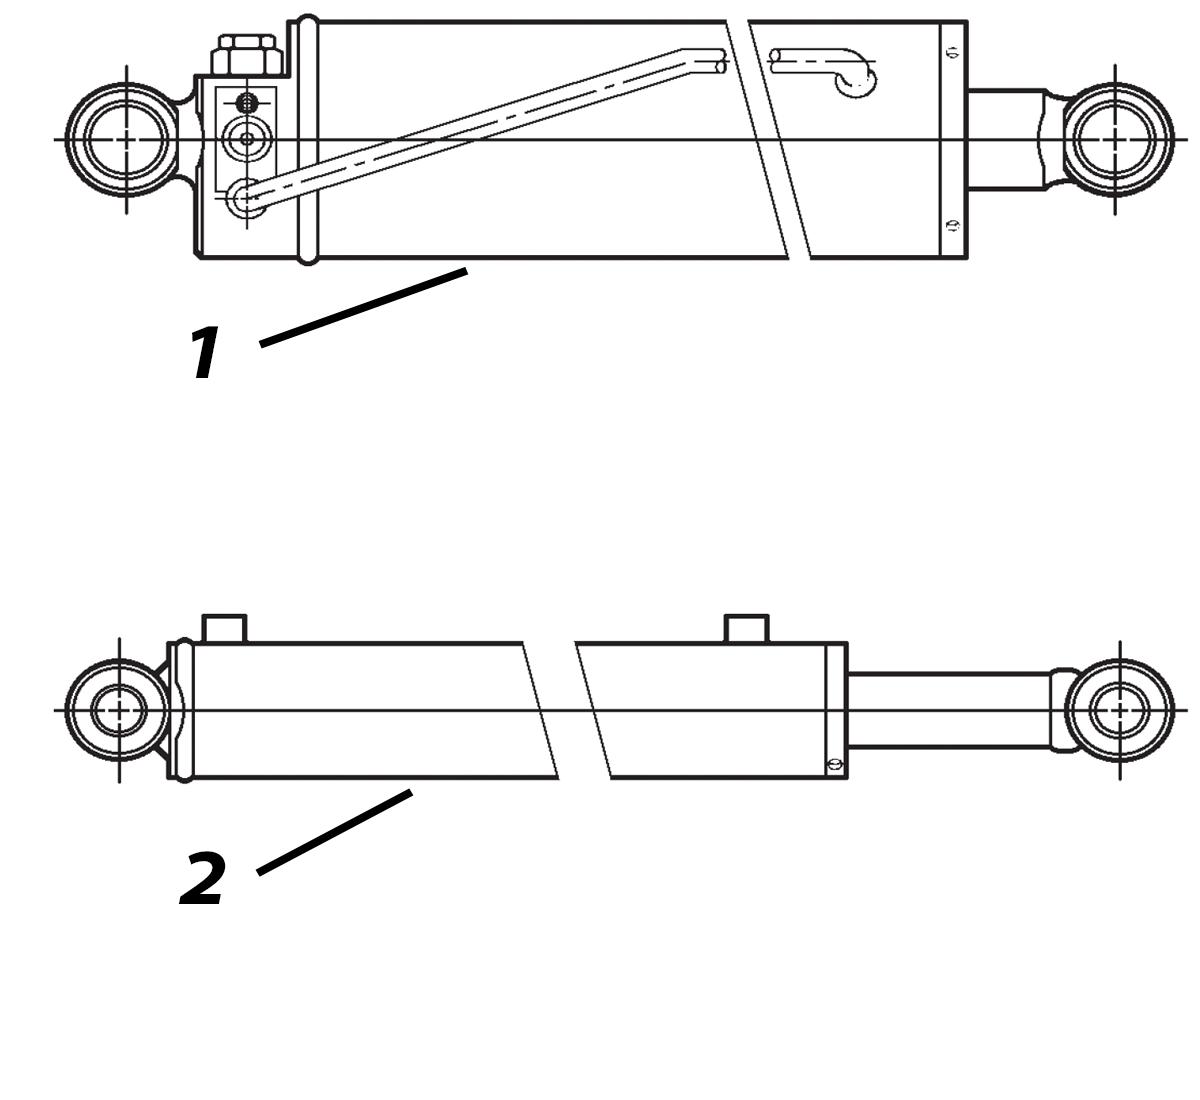 Breathtaking M443 Monarch Pump Wiring Diagram Images - Best Image ...